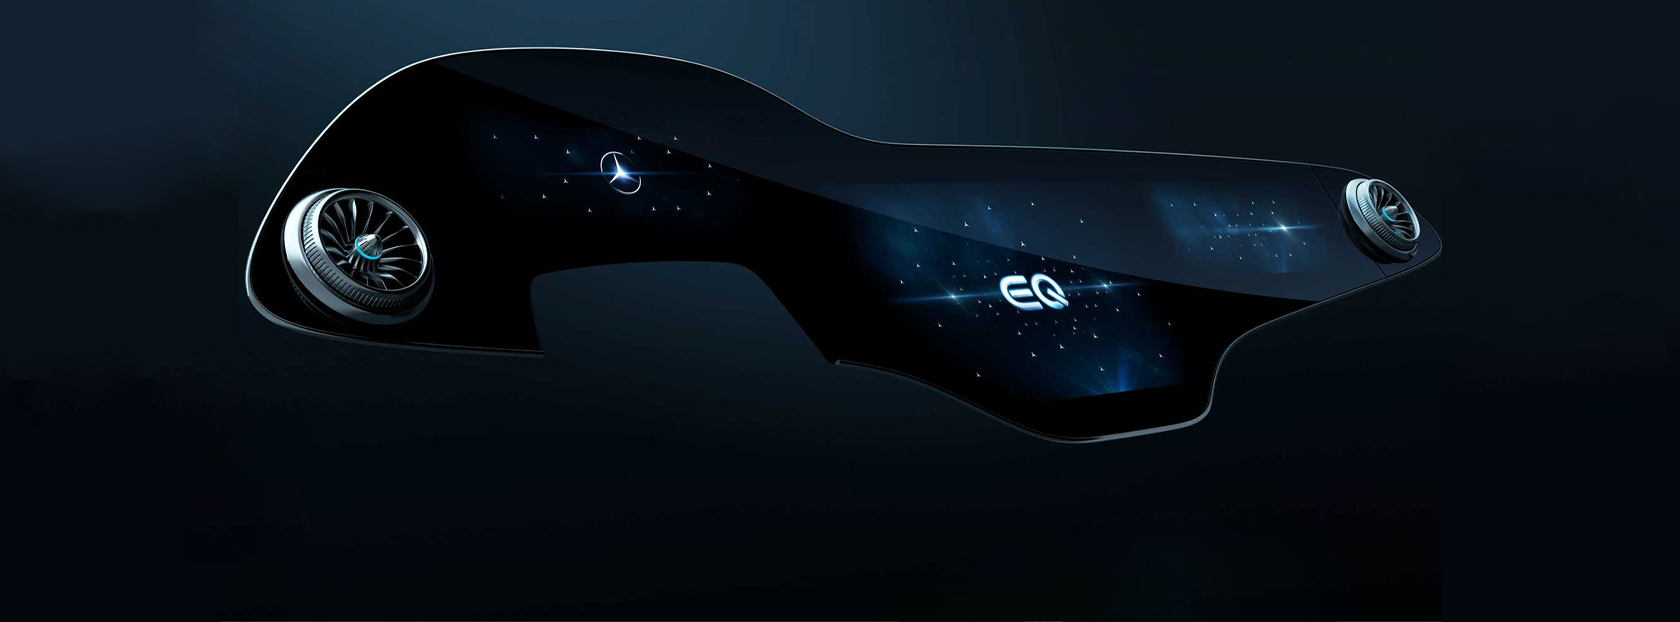 Mercedes-Benz Presents MBUX Hyperscreen to EQS